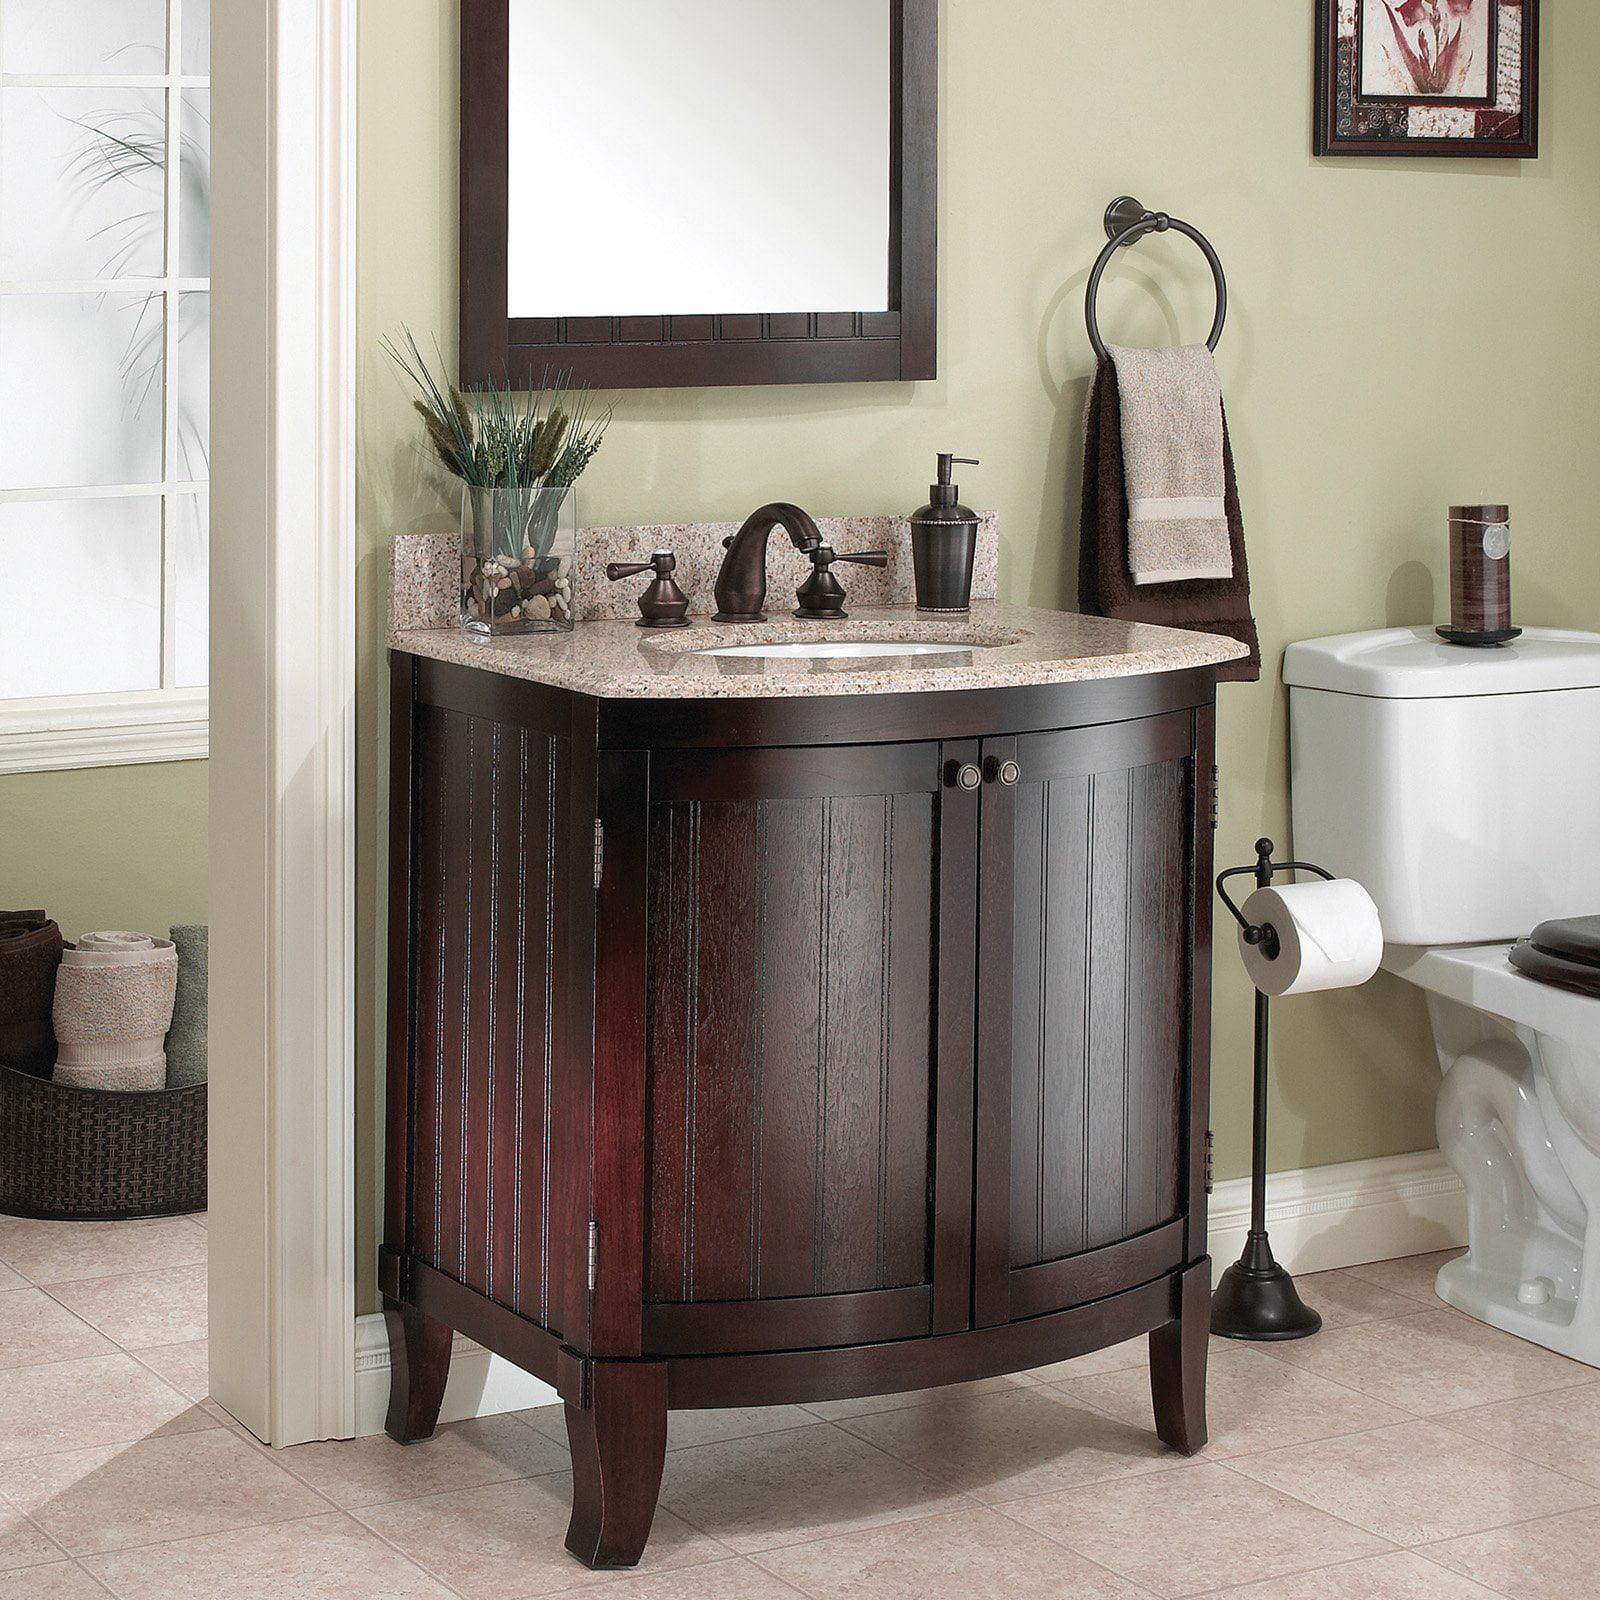 Foremost Bellani 30 In Single Bathroom Vanity With Optional Mirror Cherry Vanity Only Walmart Com Walmart Com